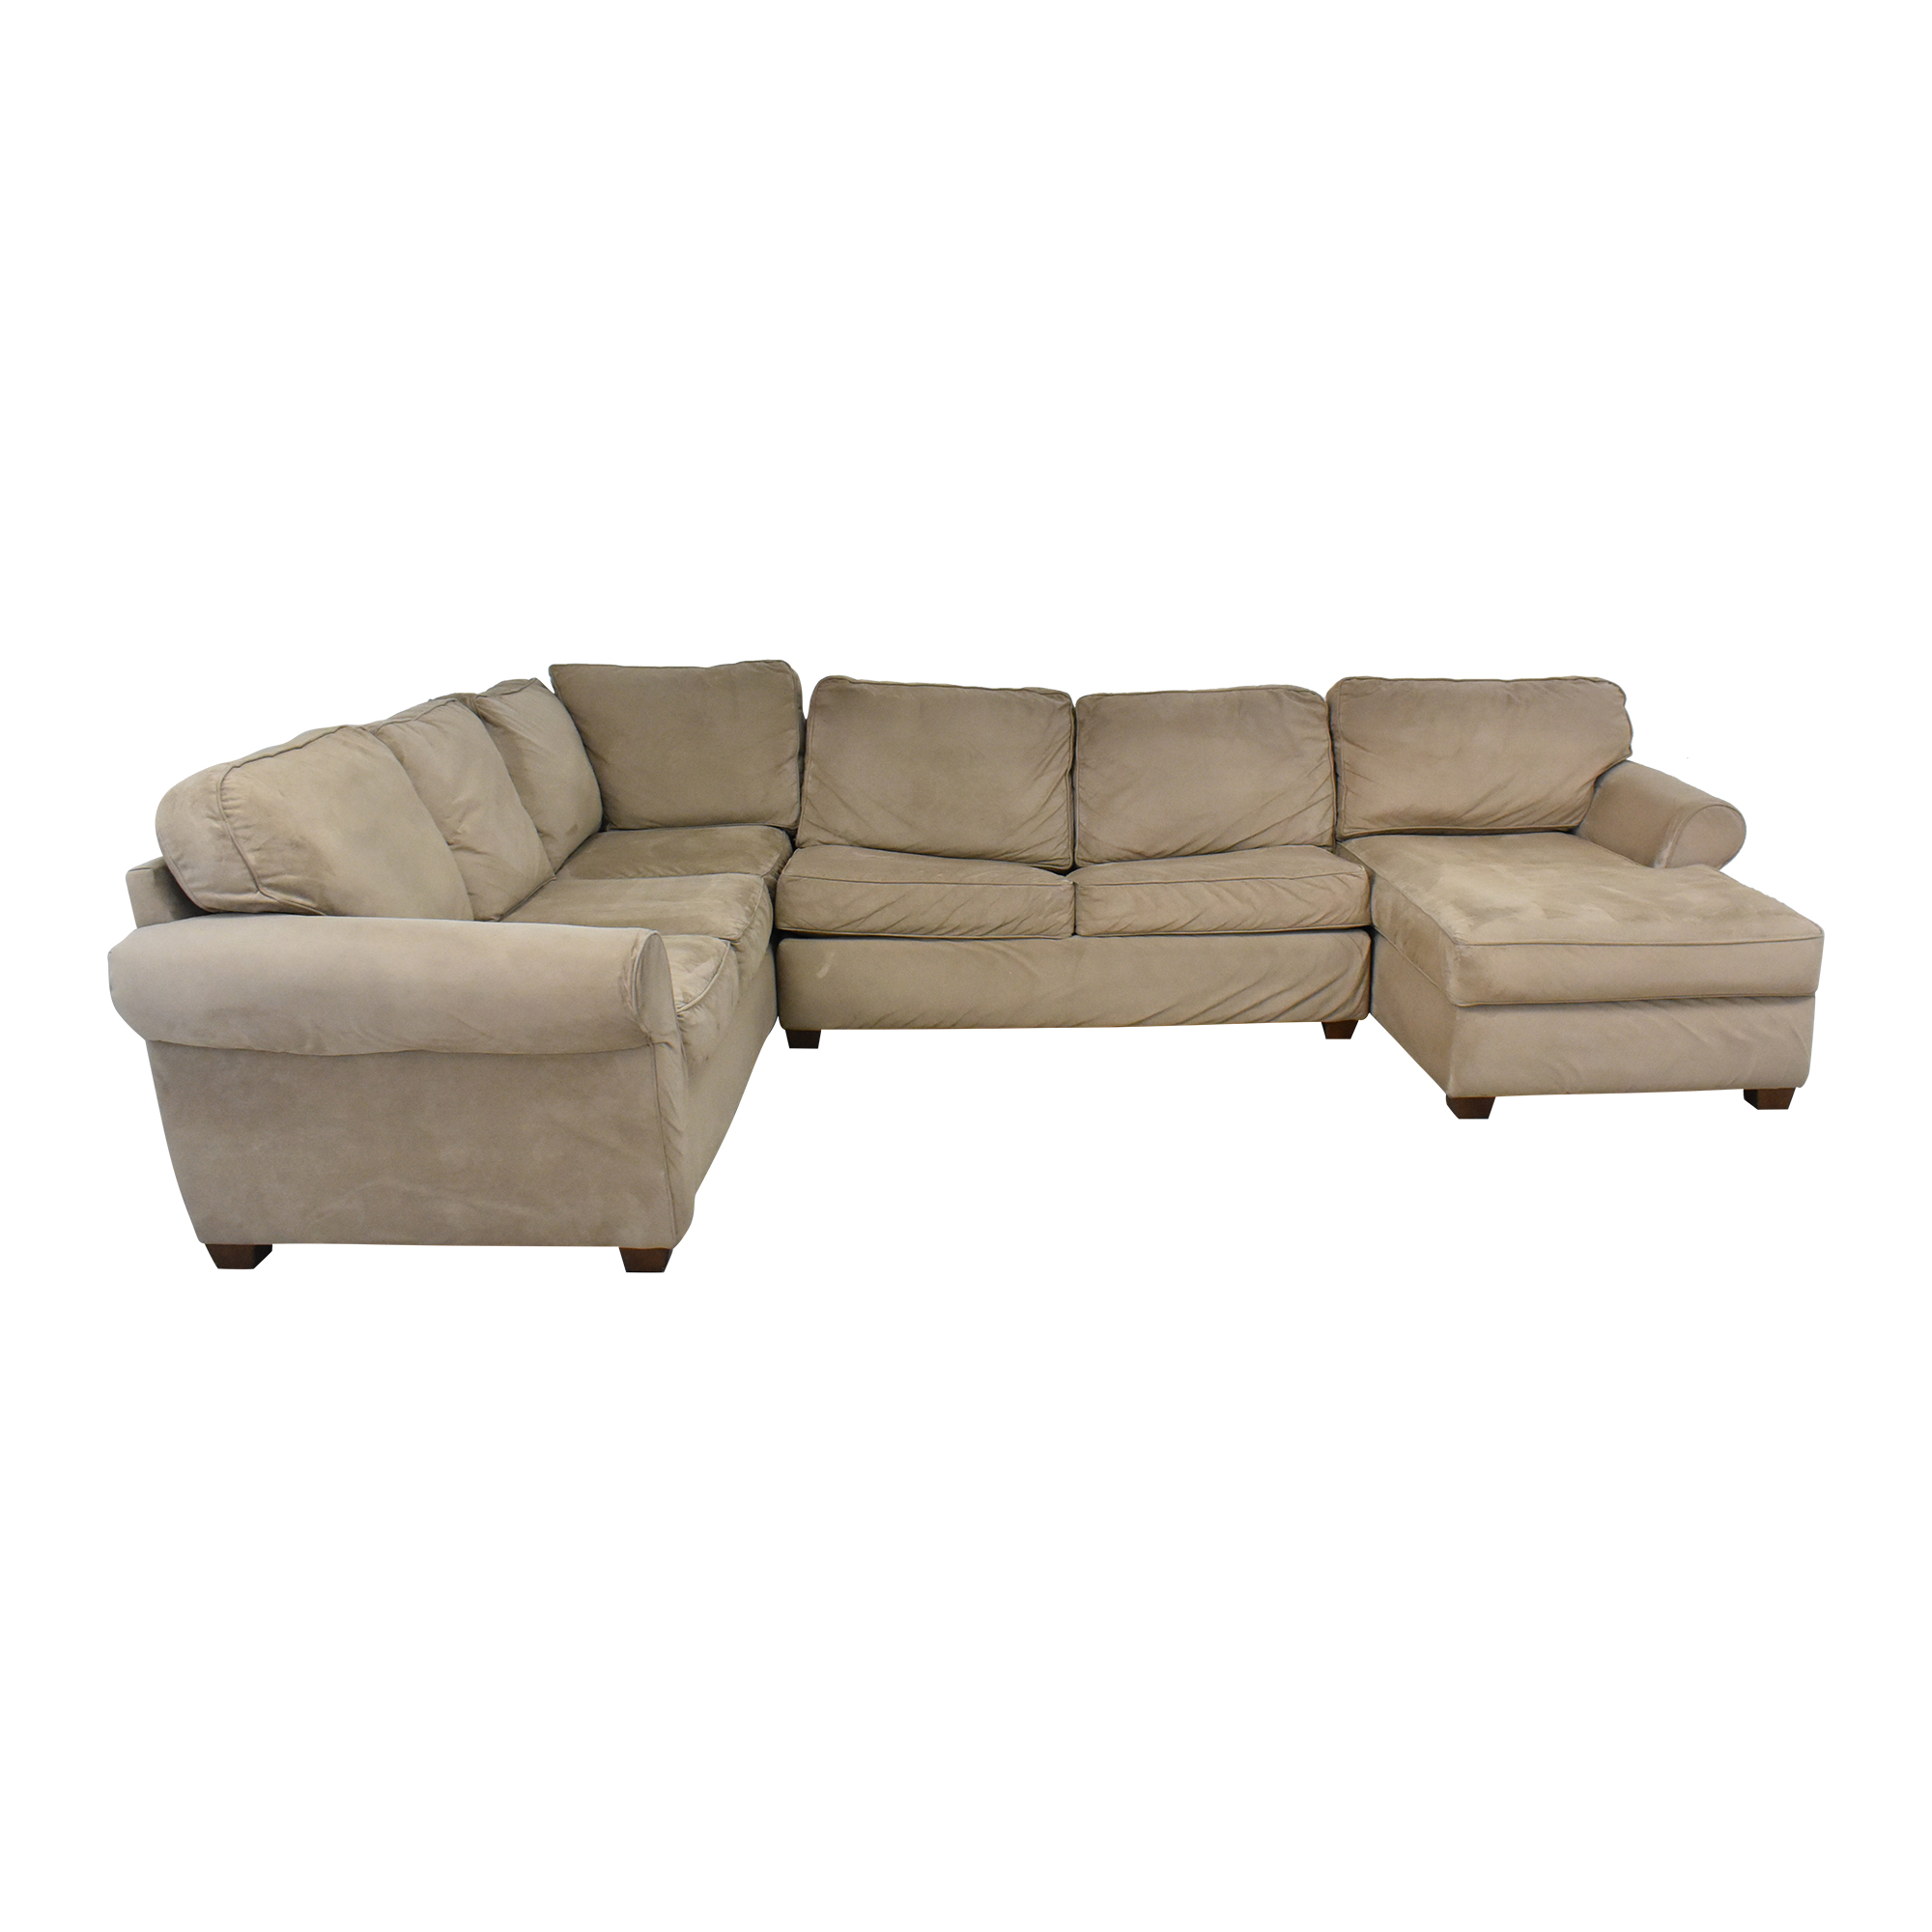 buy Macy's Chaise Sectional Sleeper Sofa with Ottoman Macy's